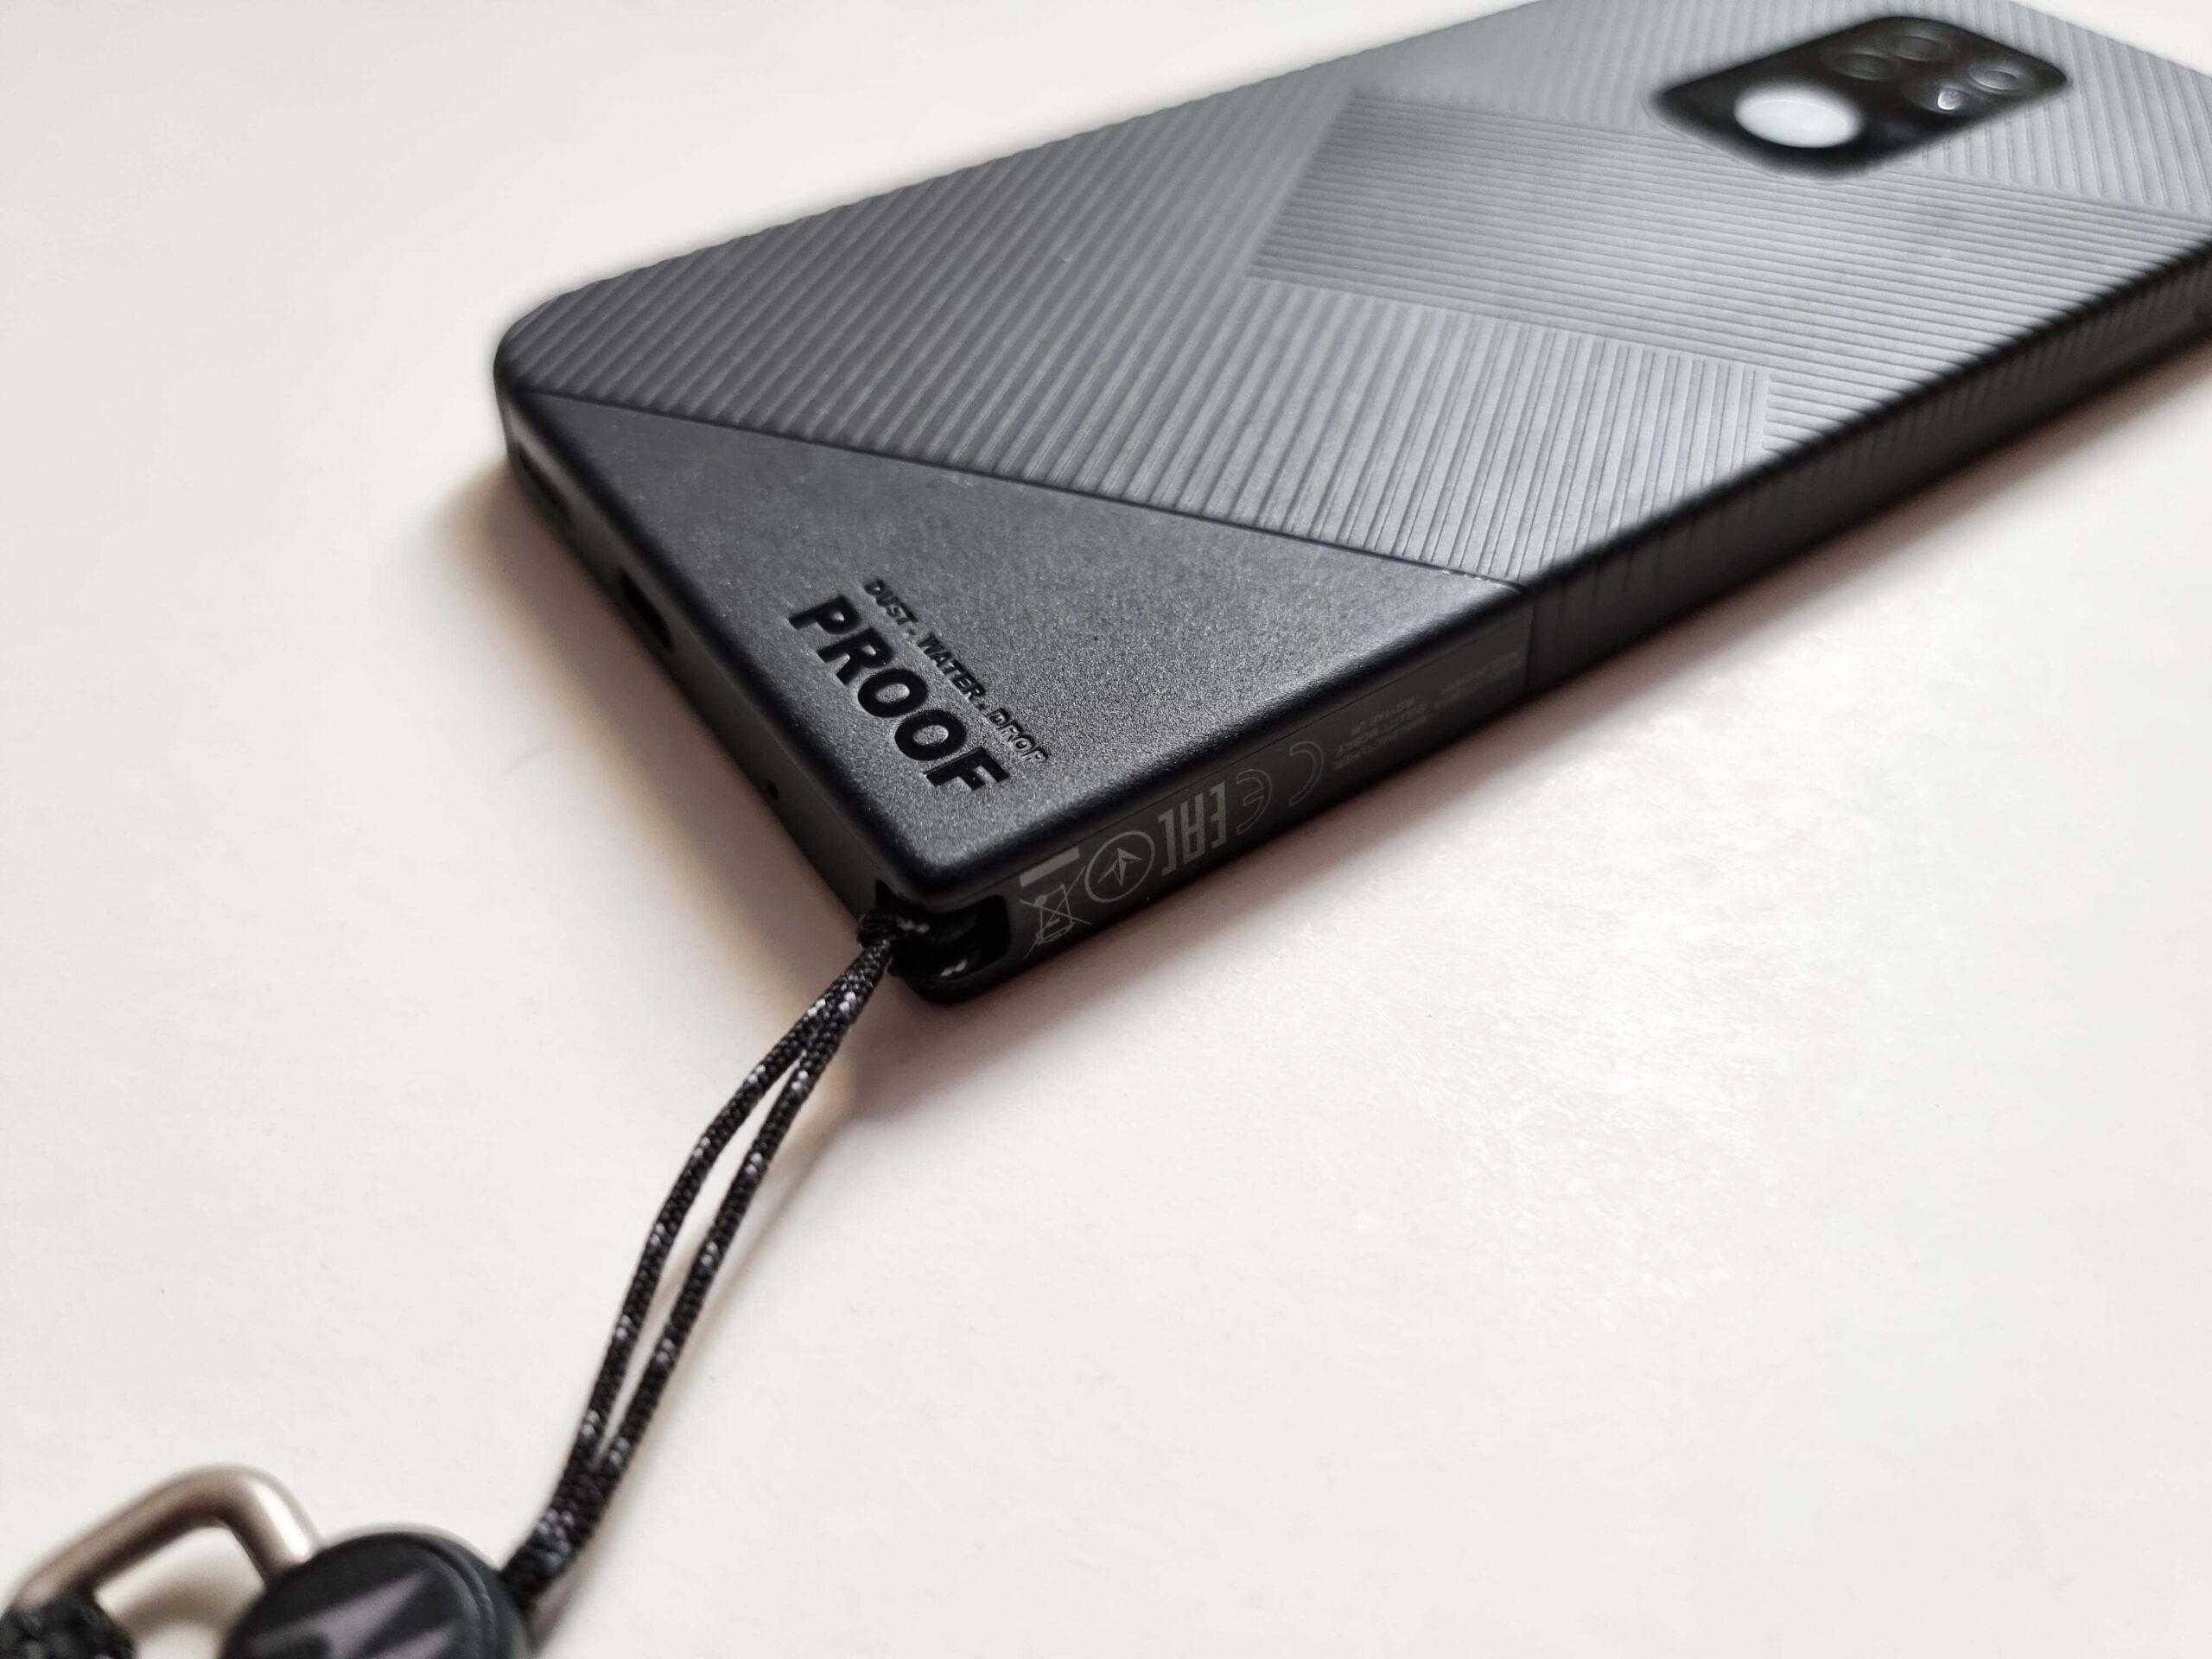 Motorola Defy Review Romana si Pareri - 1